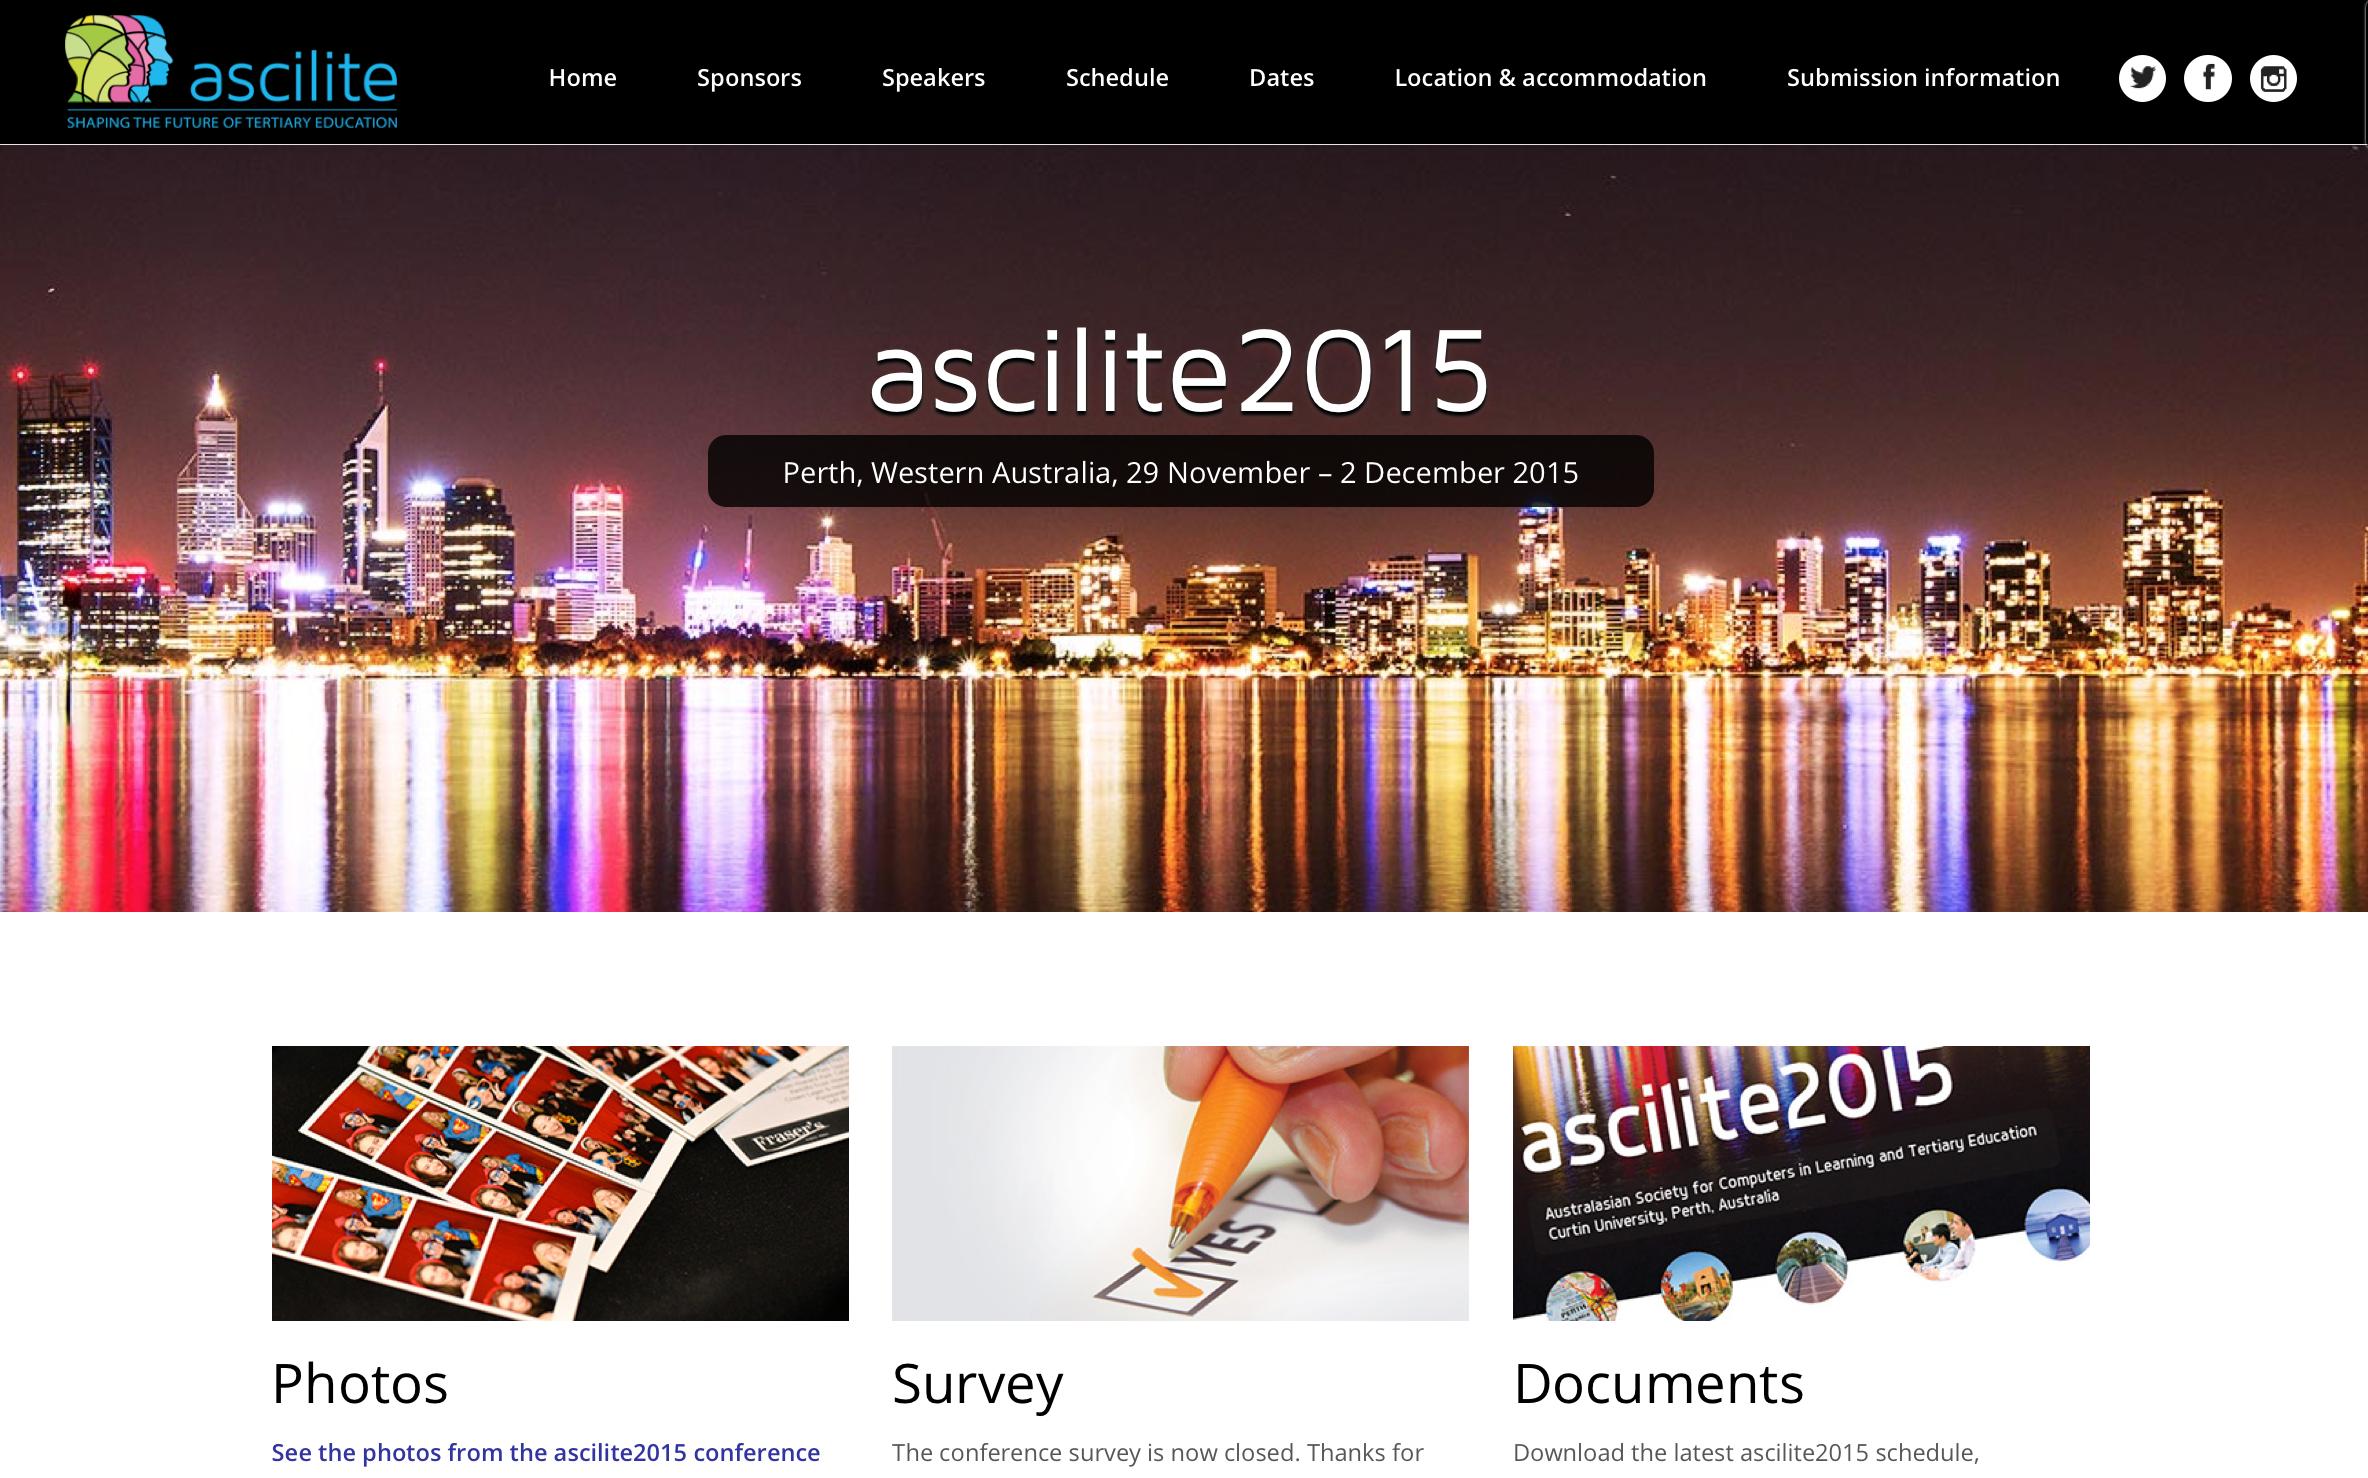 Ascilite 2015 logo